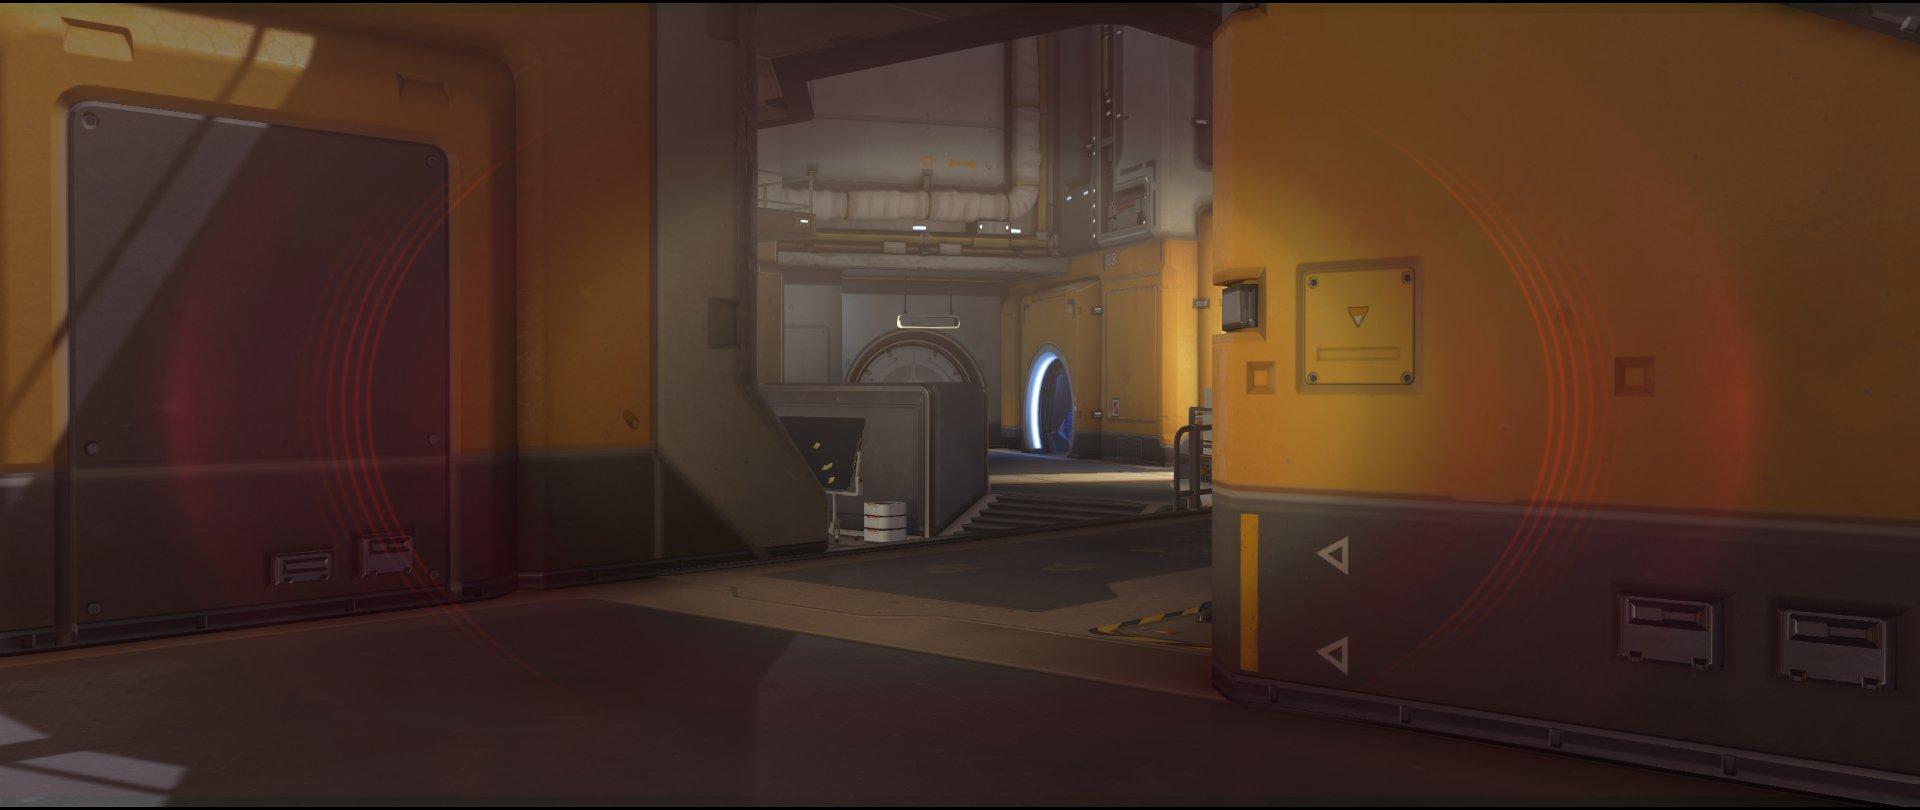 Below+Tank+to+connector+defense+sniping+spot+Widowmaker+Horizon+Lunar+Colony+Overwatch